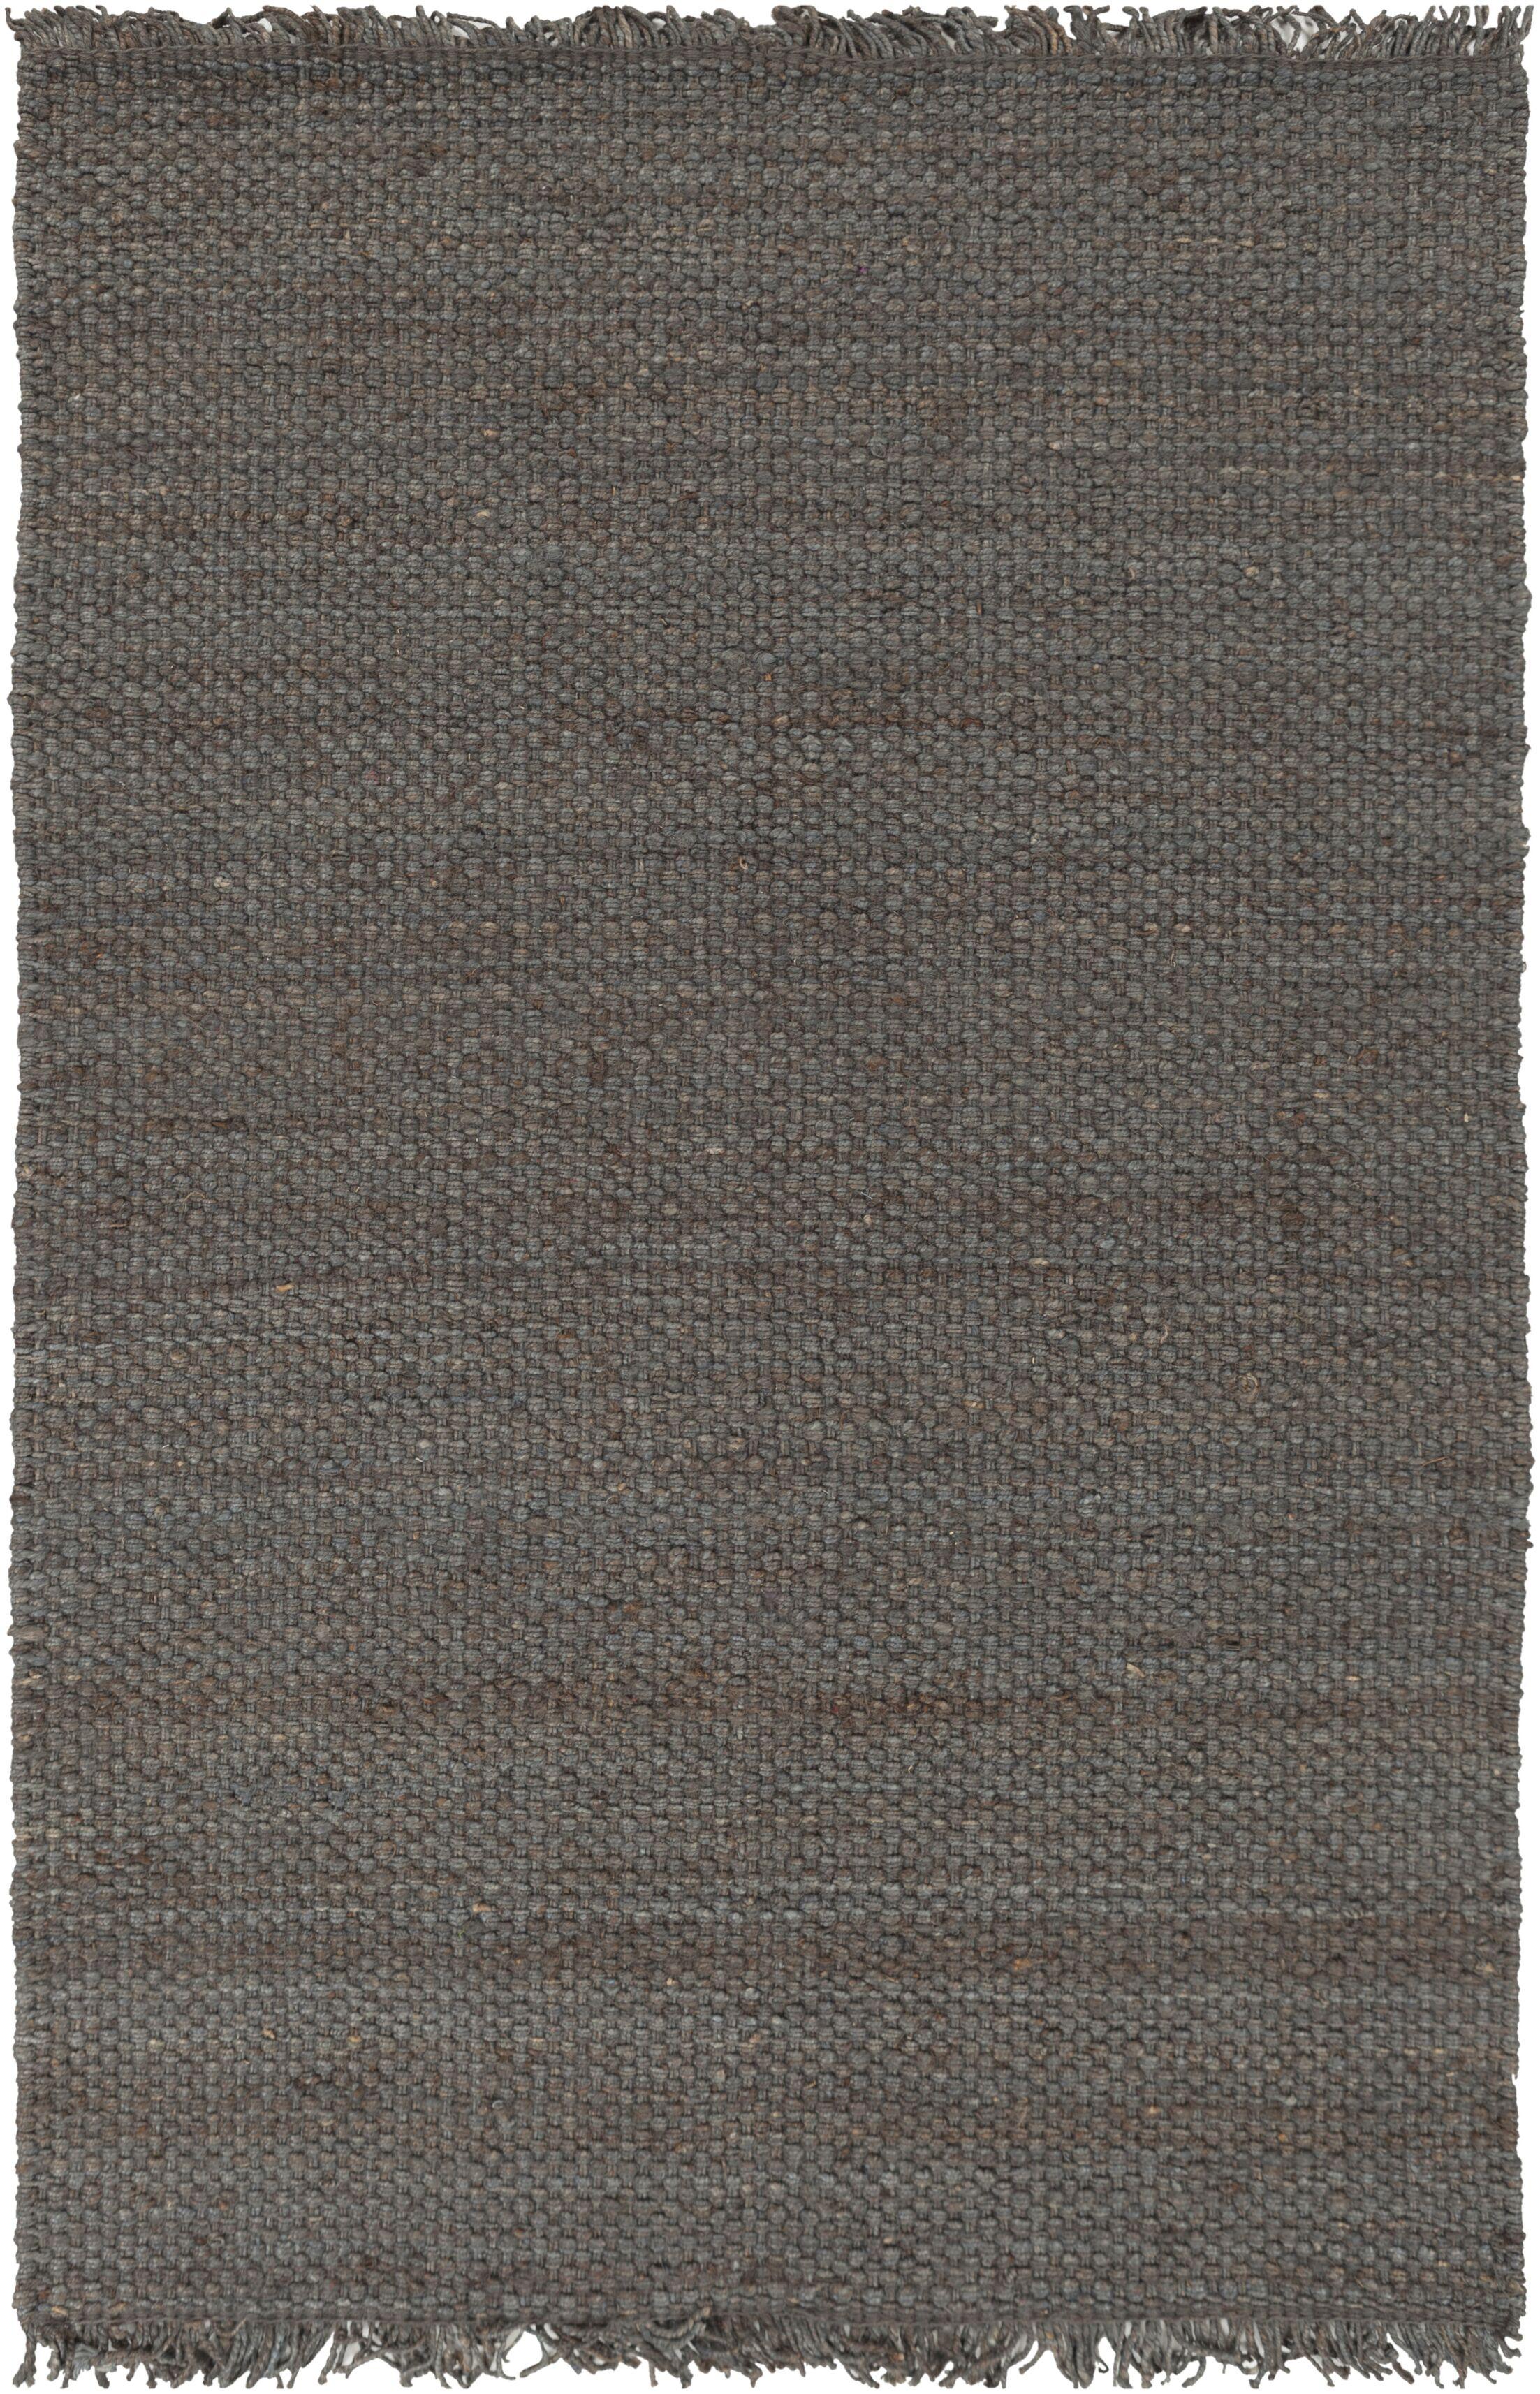 Pineda Hand Woven Gray Area Rug Rug Size: Rectangle 5' x 7'6